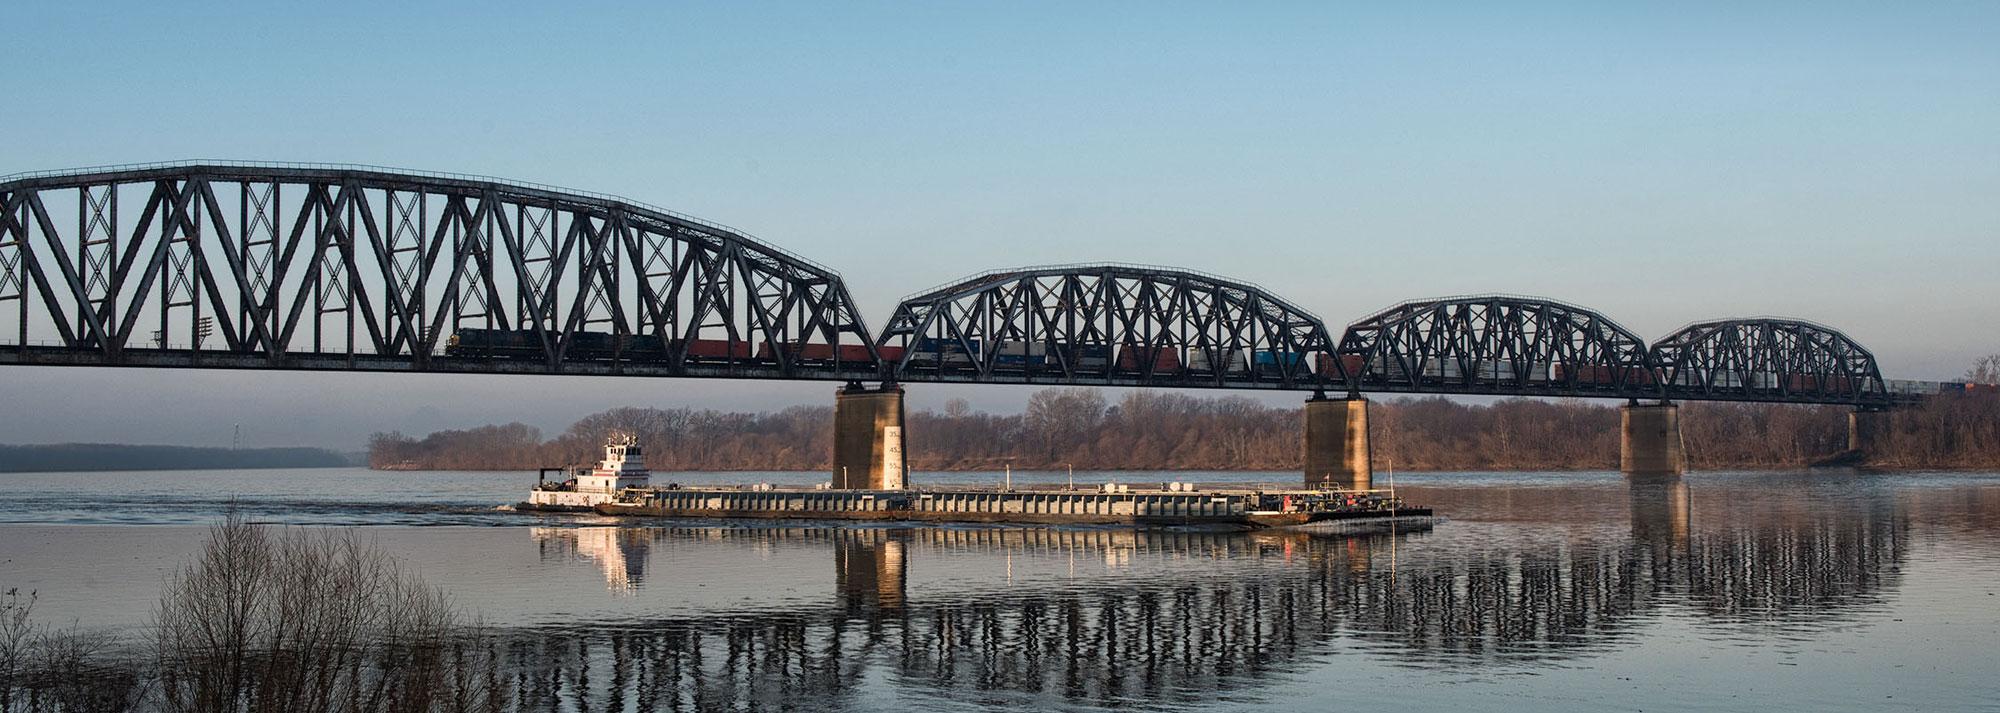 Barge-Bridge-Slide